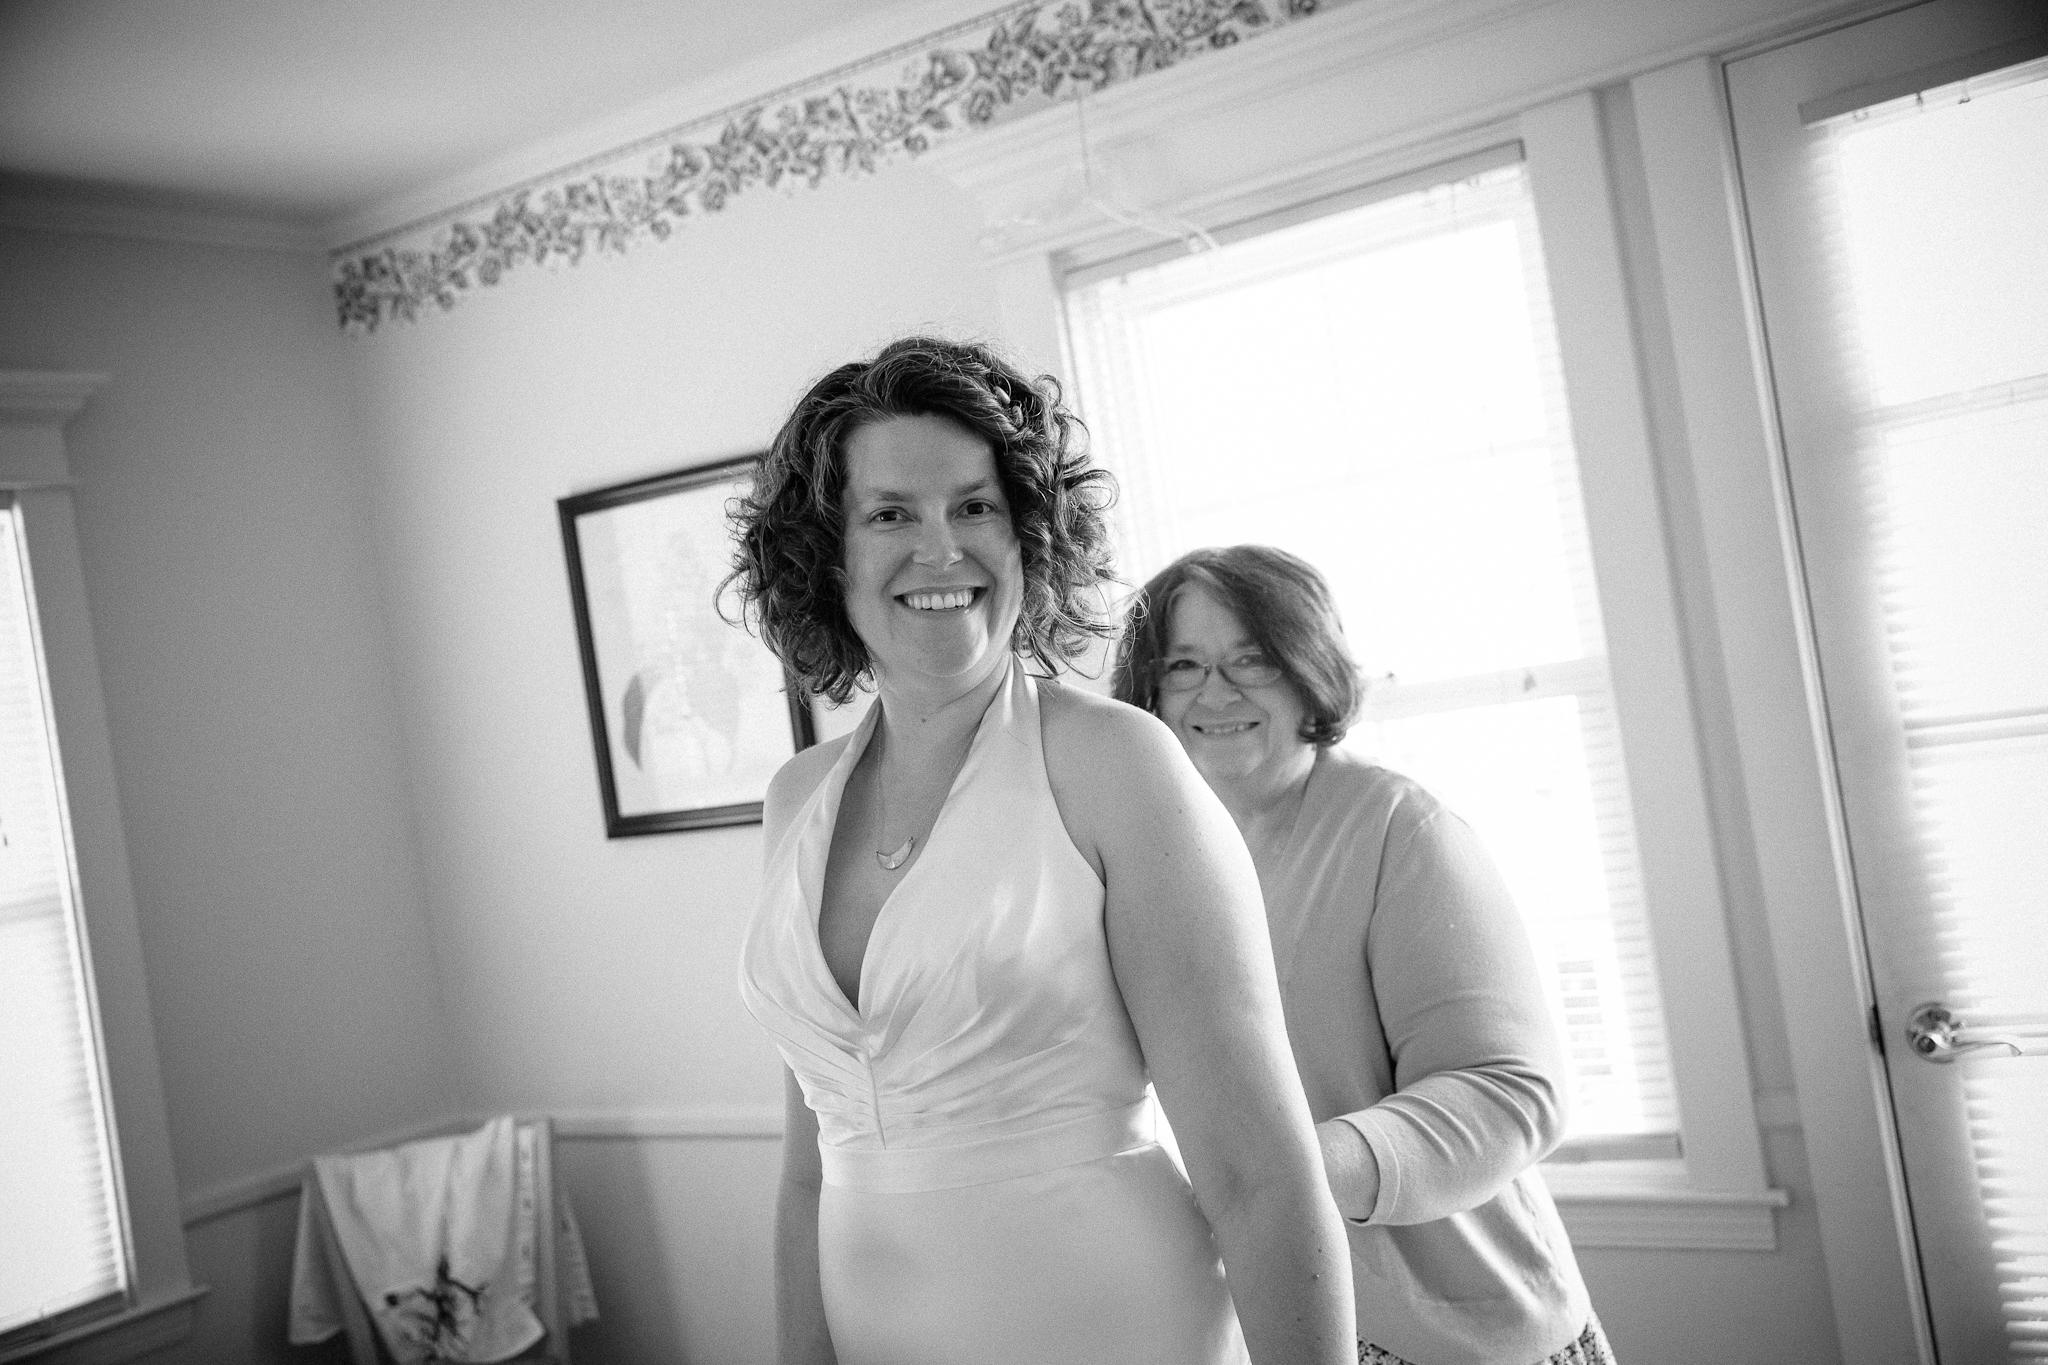 crystalchristiaan_weddingsneakpeek_2014_jenniferleahyphotography-3-of-43_14139987800_o.jpg